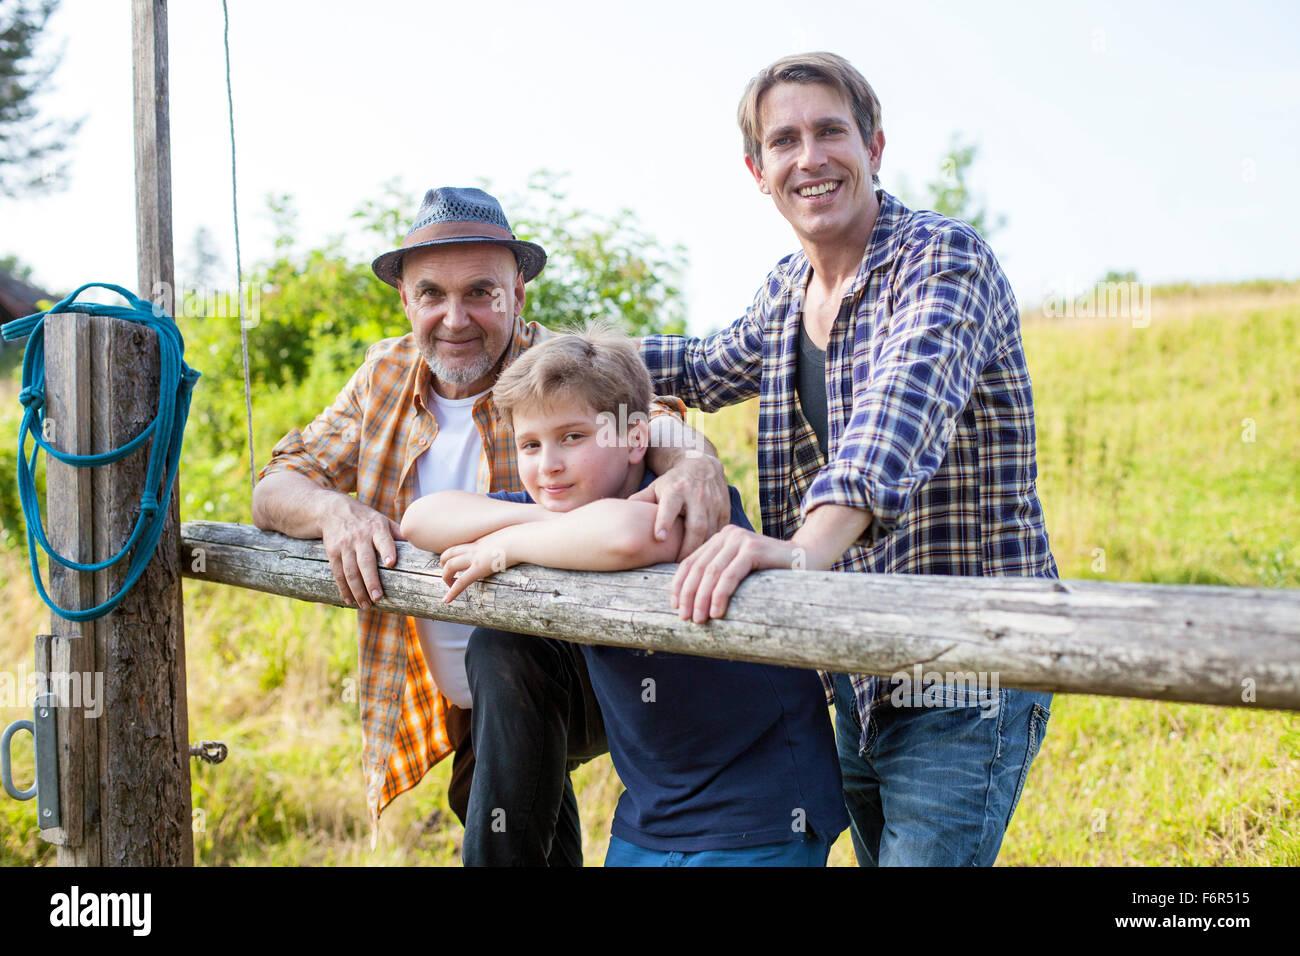 Portrait de multi-generation family by fence Photo Stock